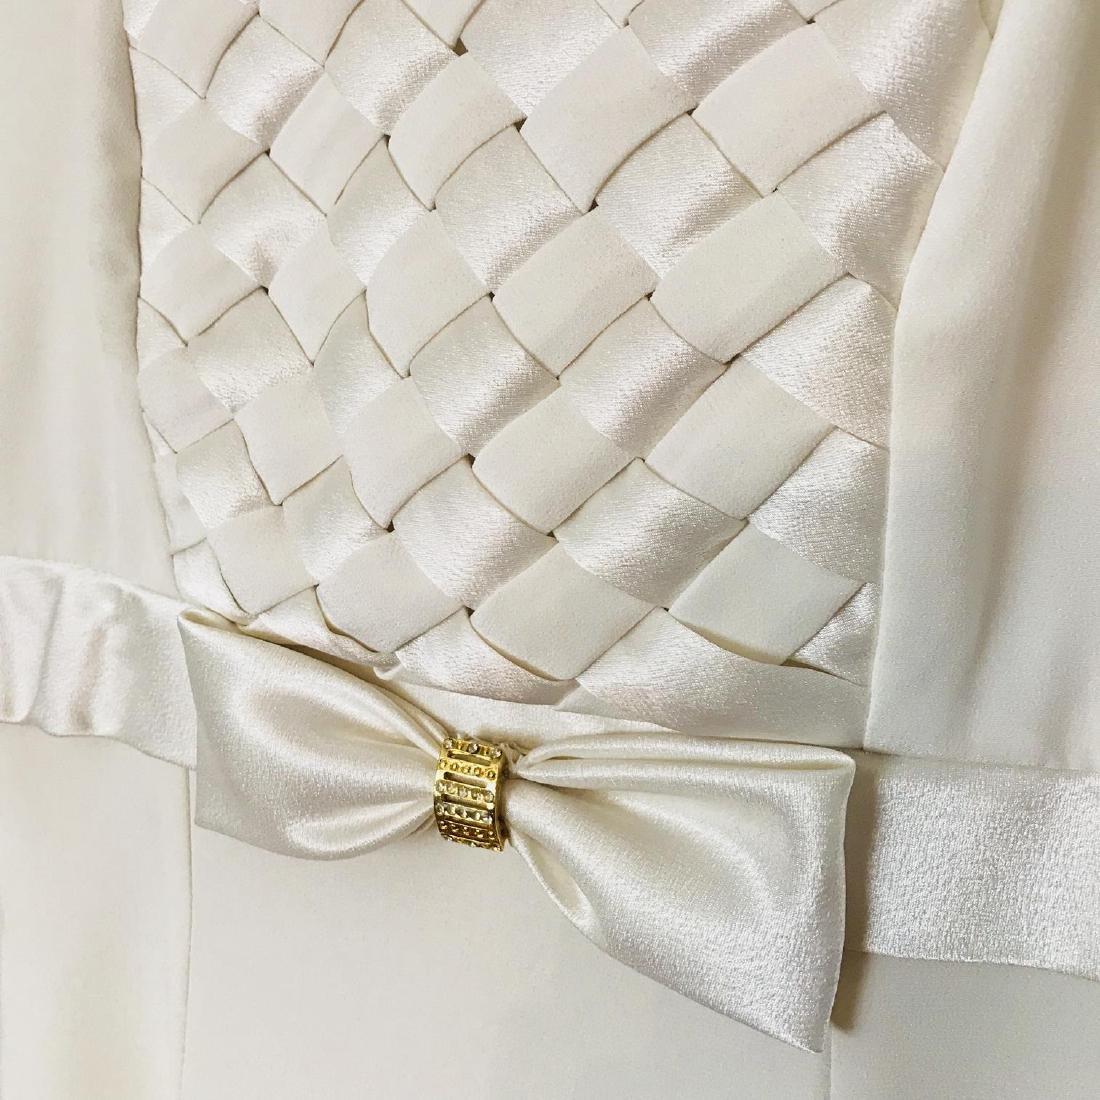 Vintage Women's White Designer Dress Size US 8 EUR 38 - 4